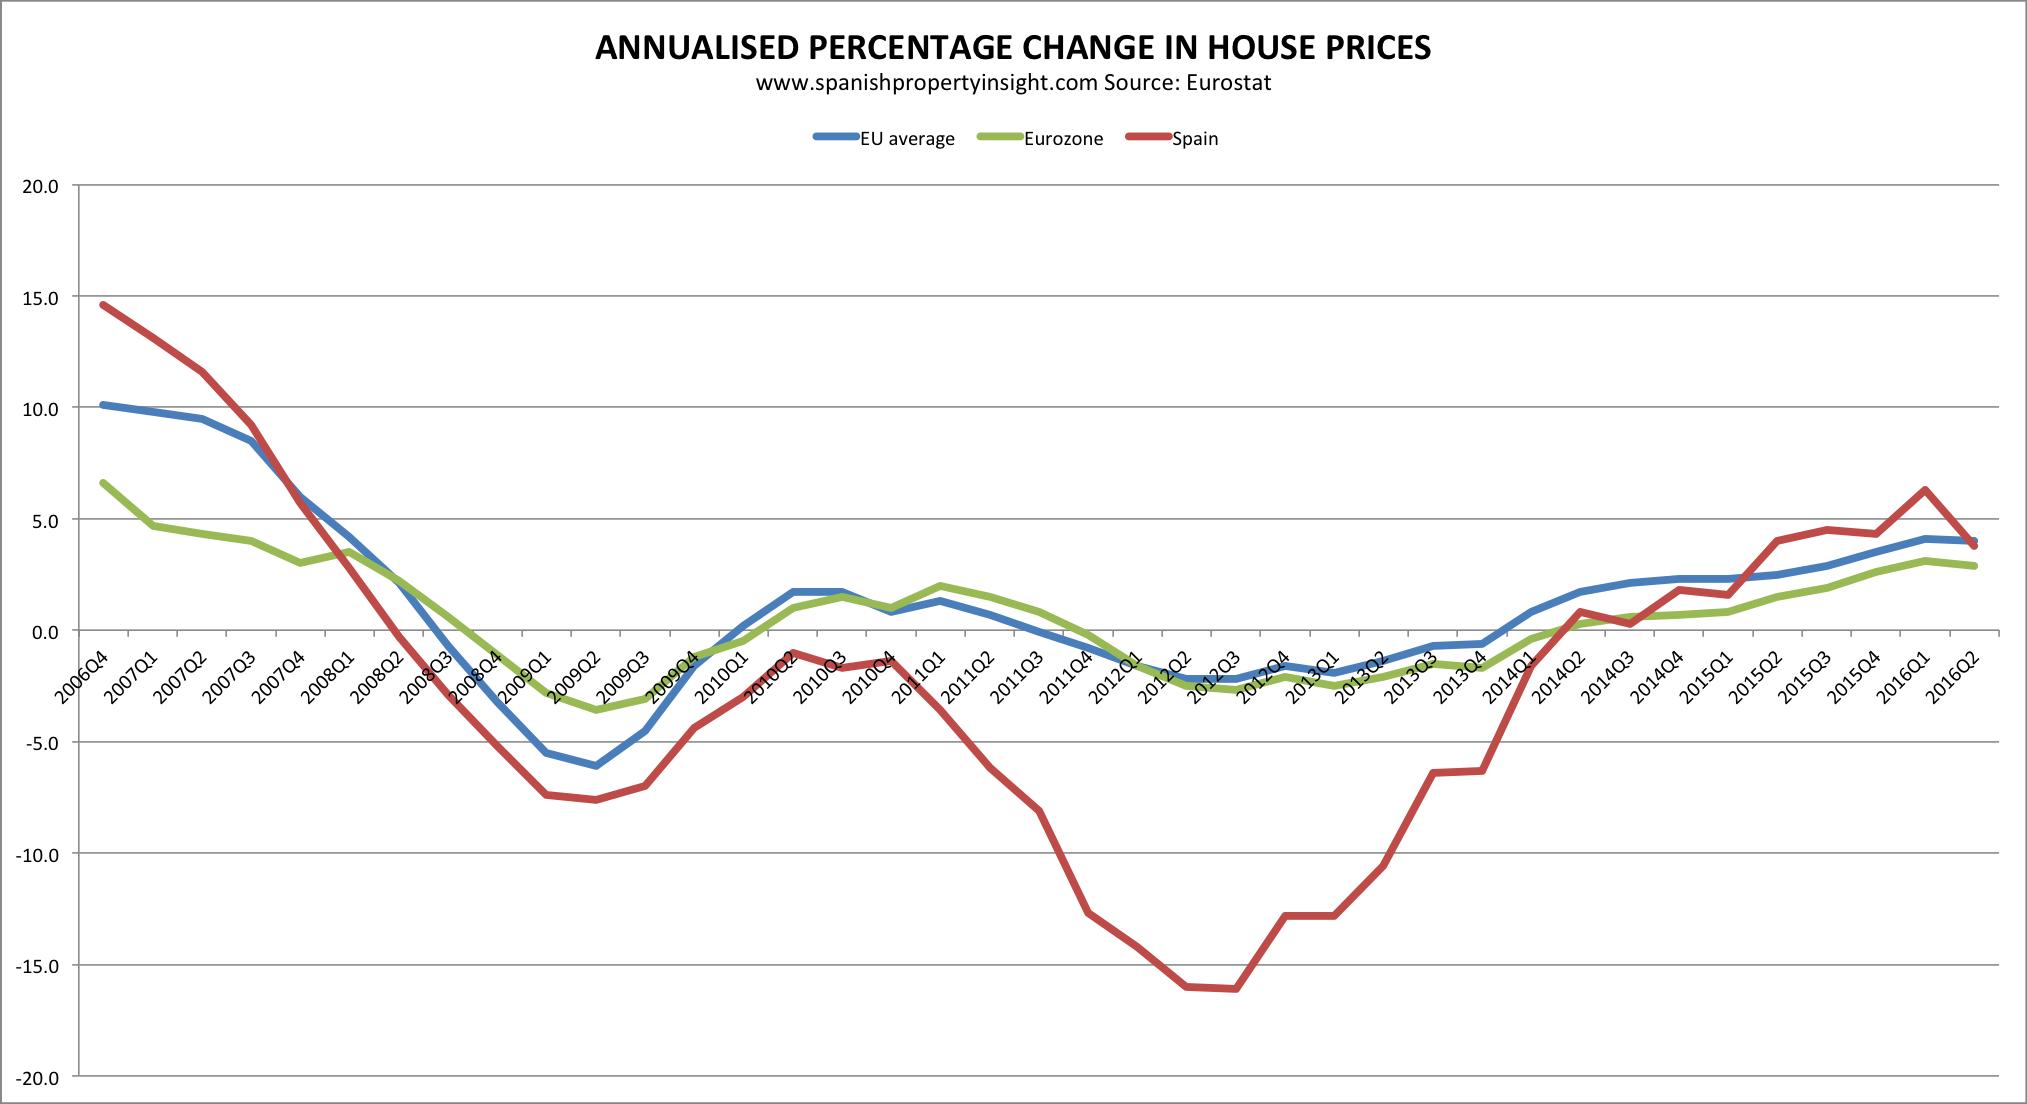 spanish and euro area house price change